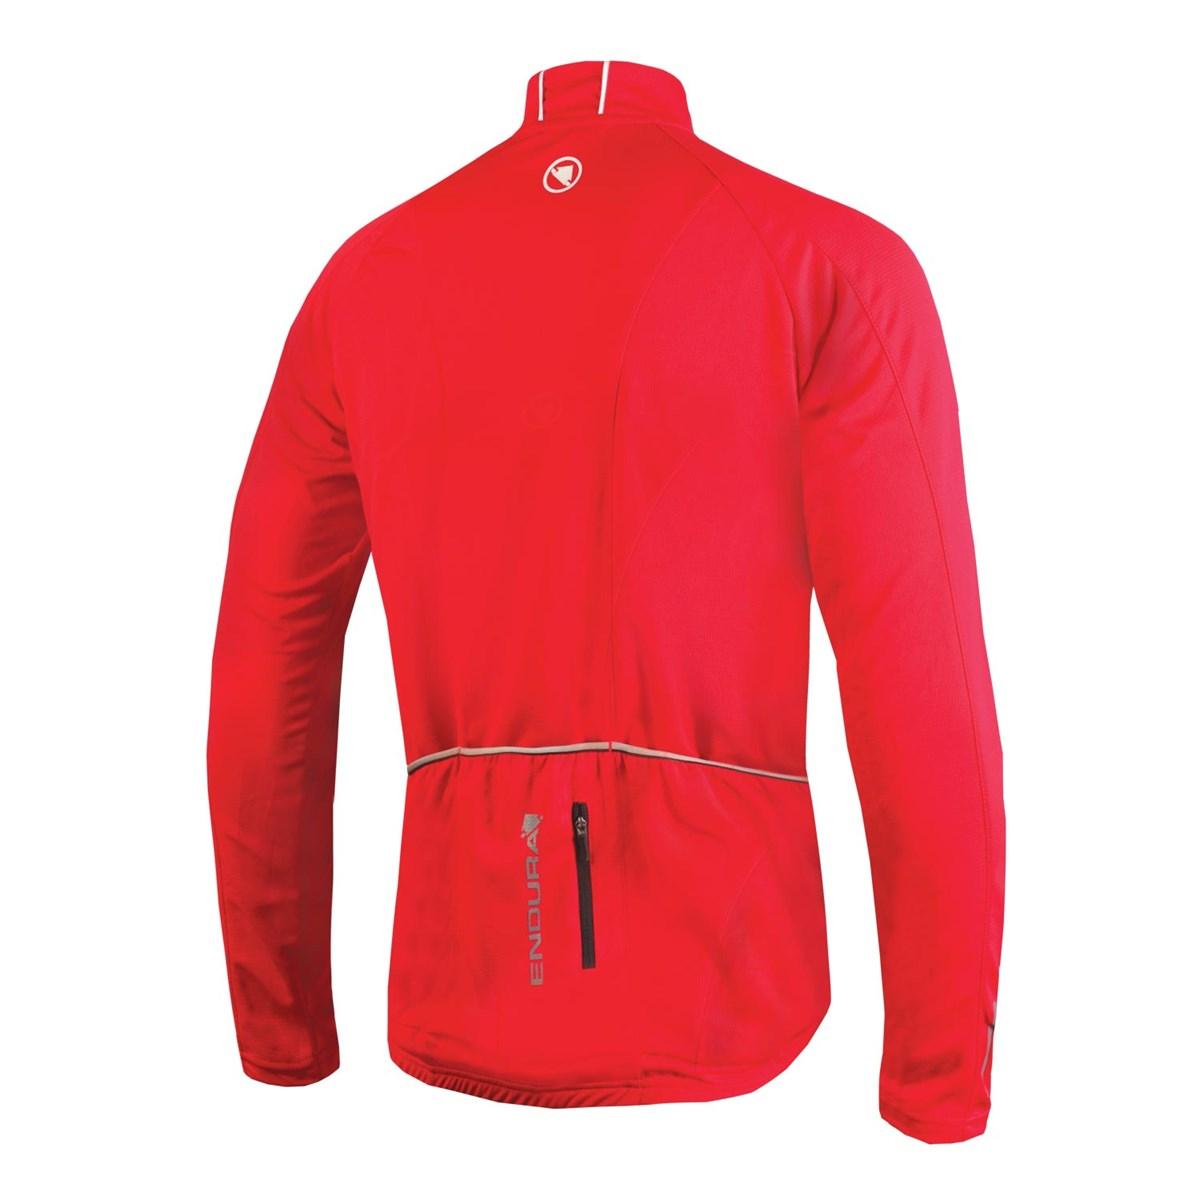 Endura Xtract Long Sleeve Red Cycling Jersey £33.99 28d0ba5ab